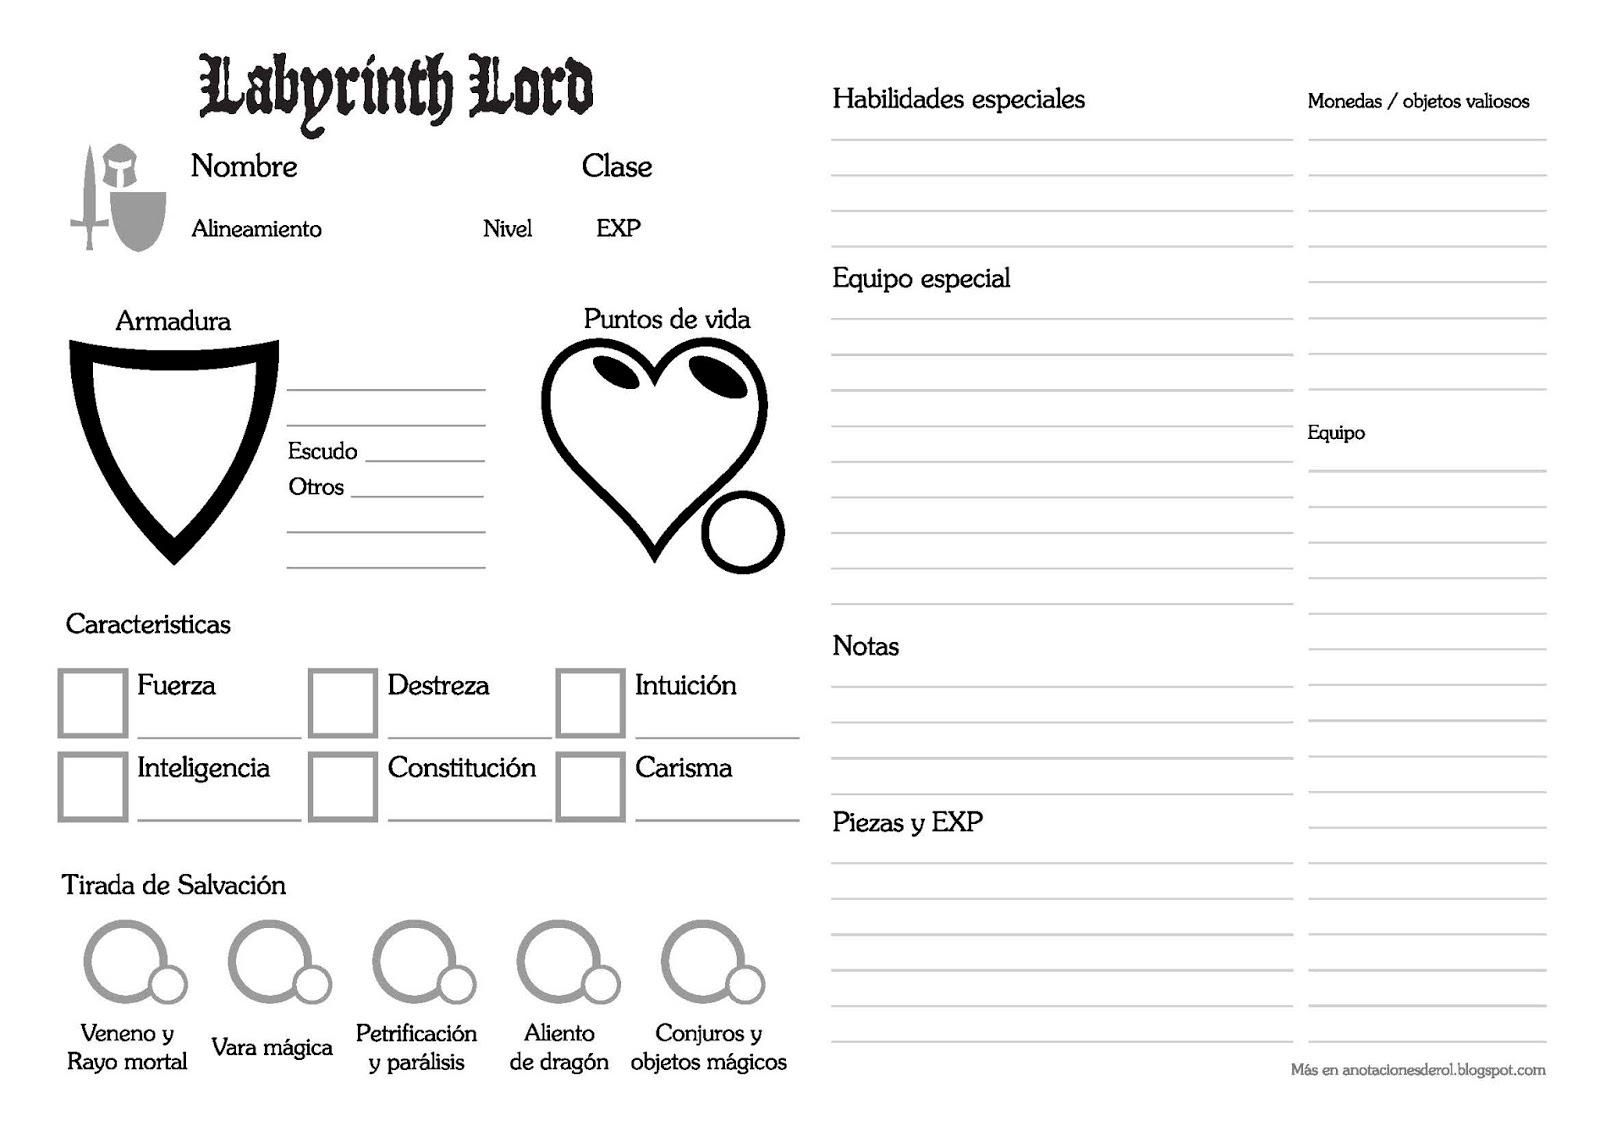 Labyrinth Lord Hoja de PJ en español. - Anotaciones de rol